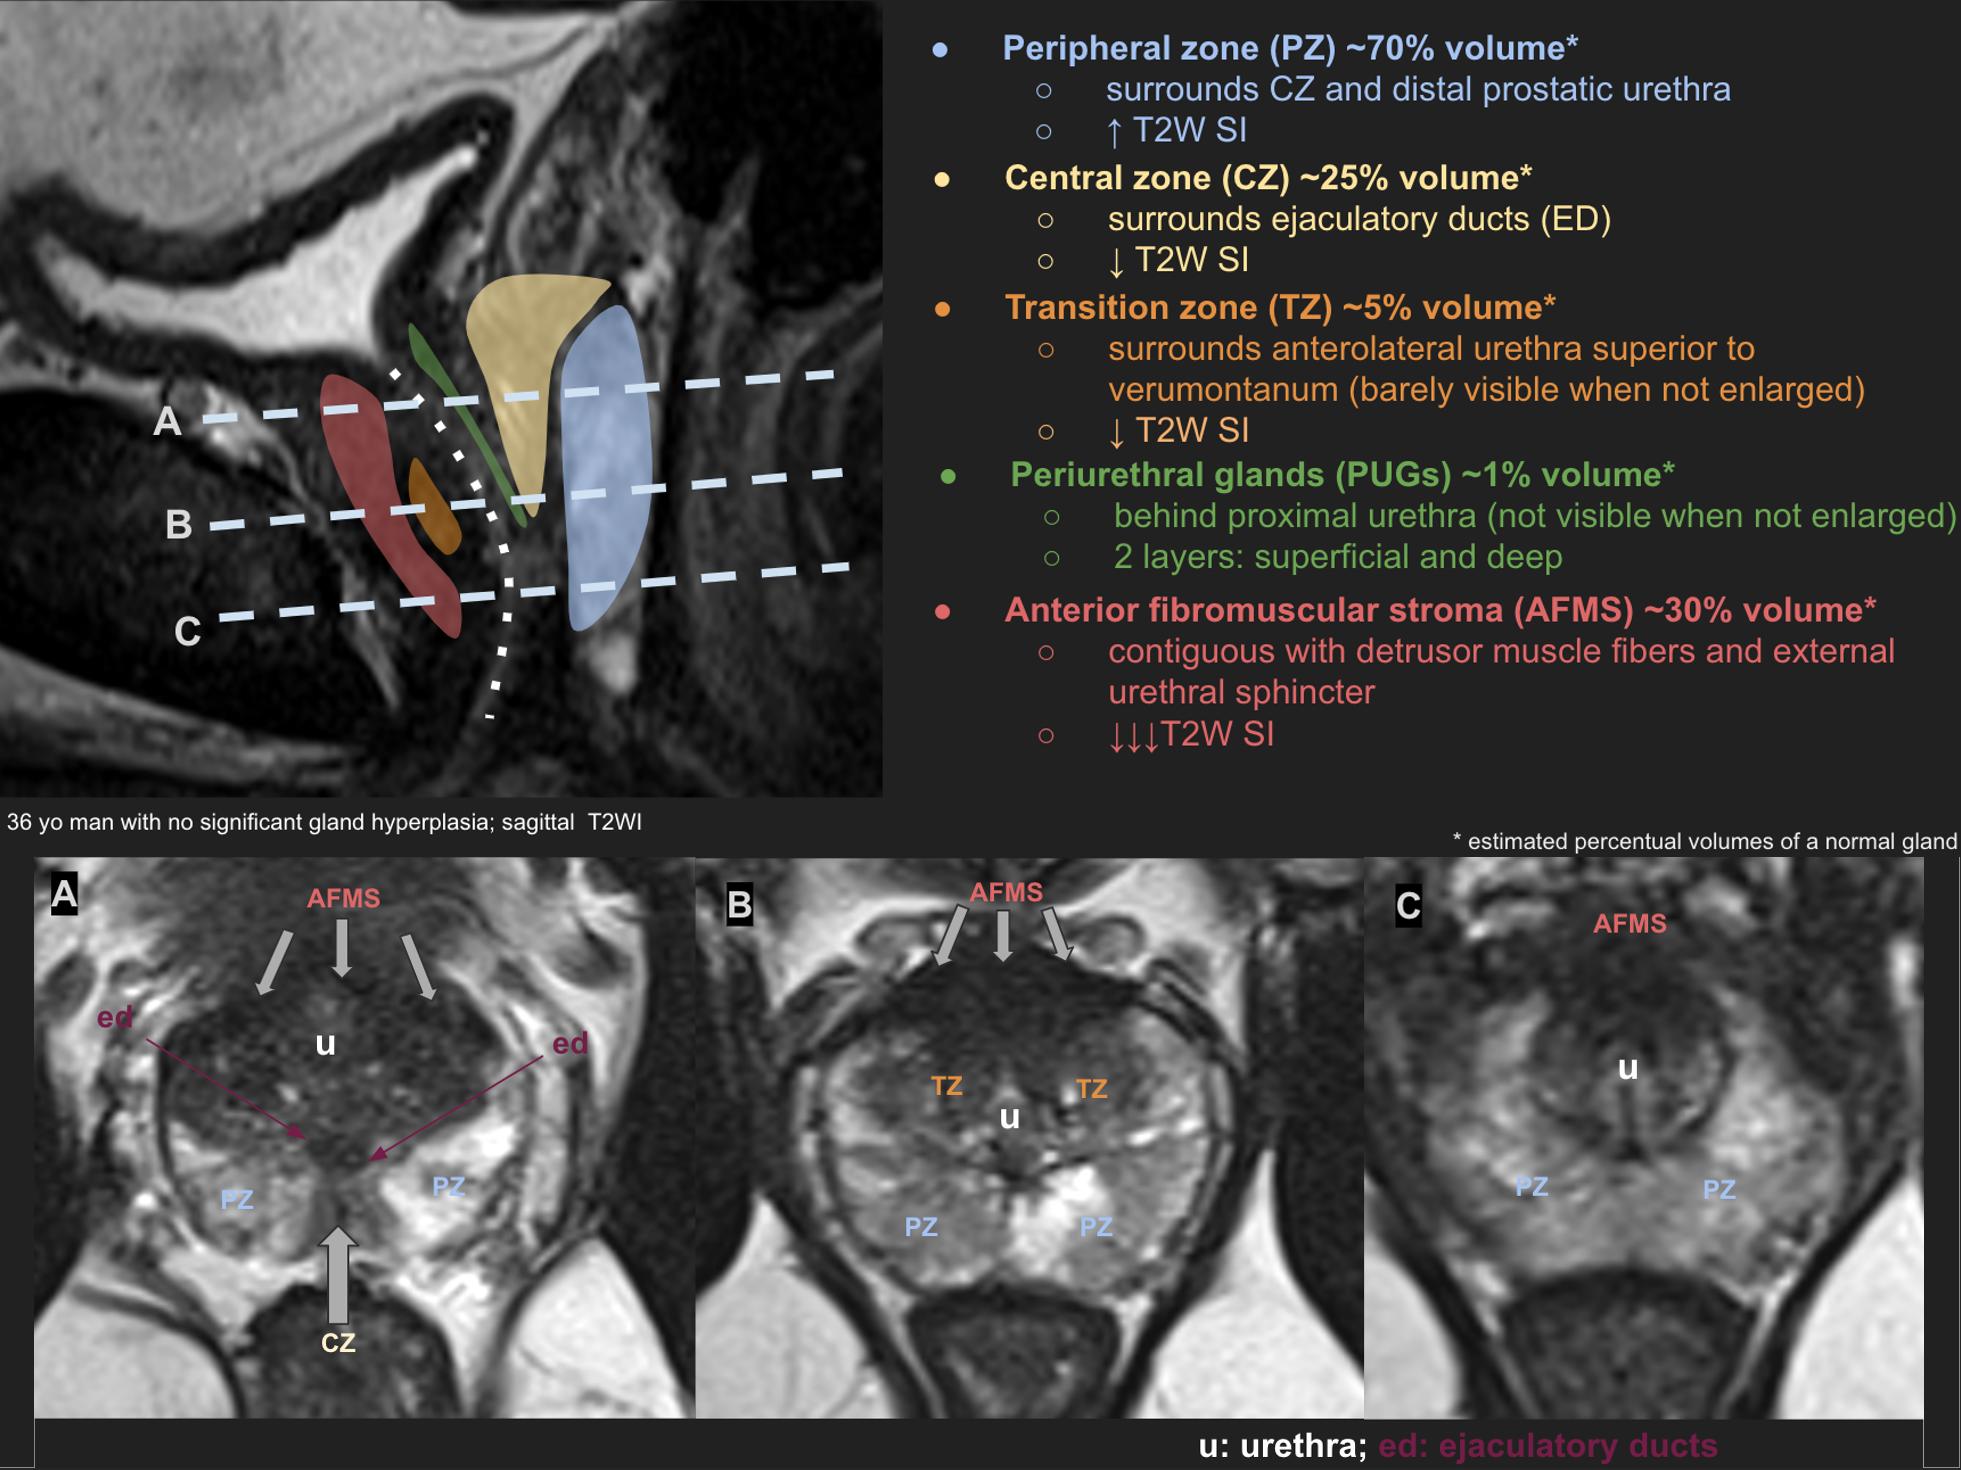 central zone tumor prostate mri katéter utáni fájdalom